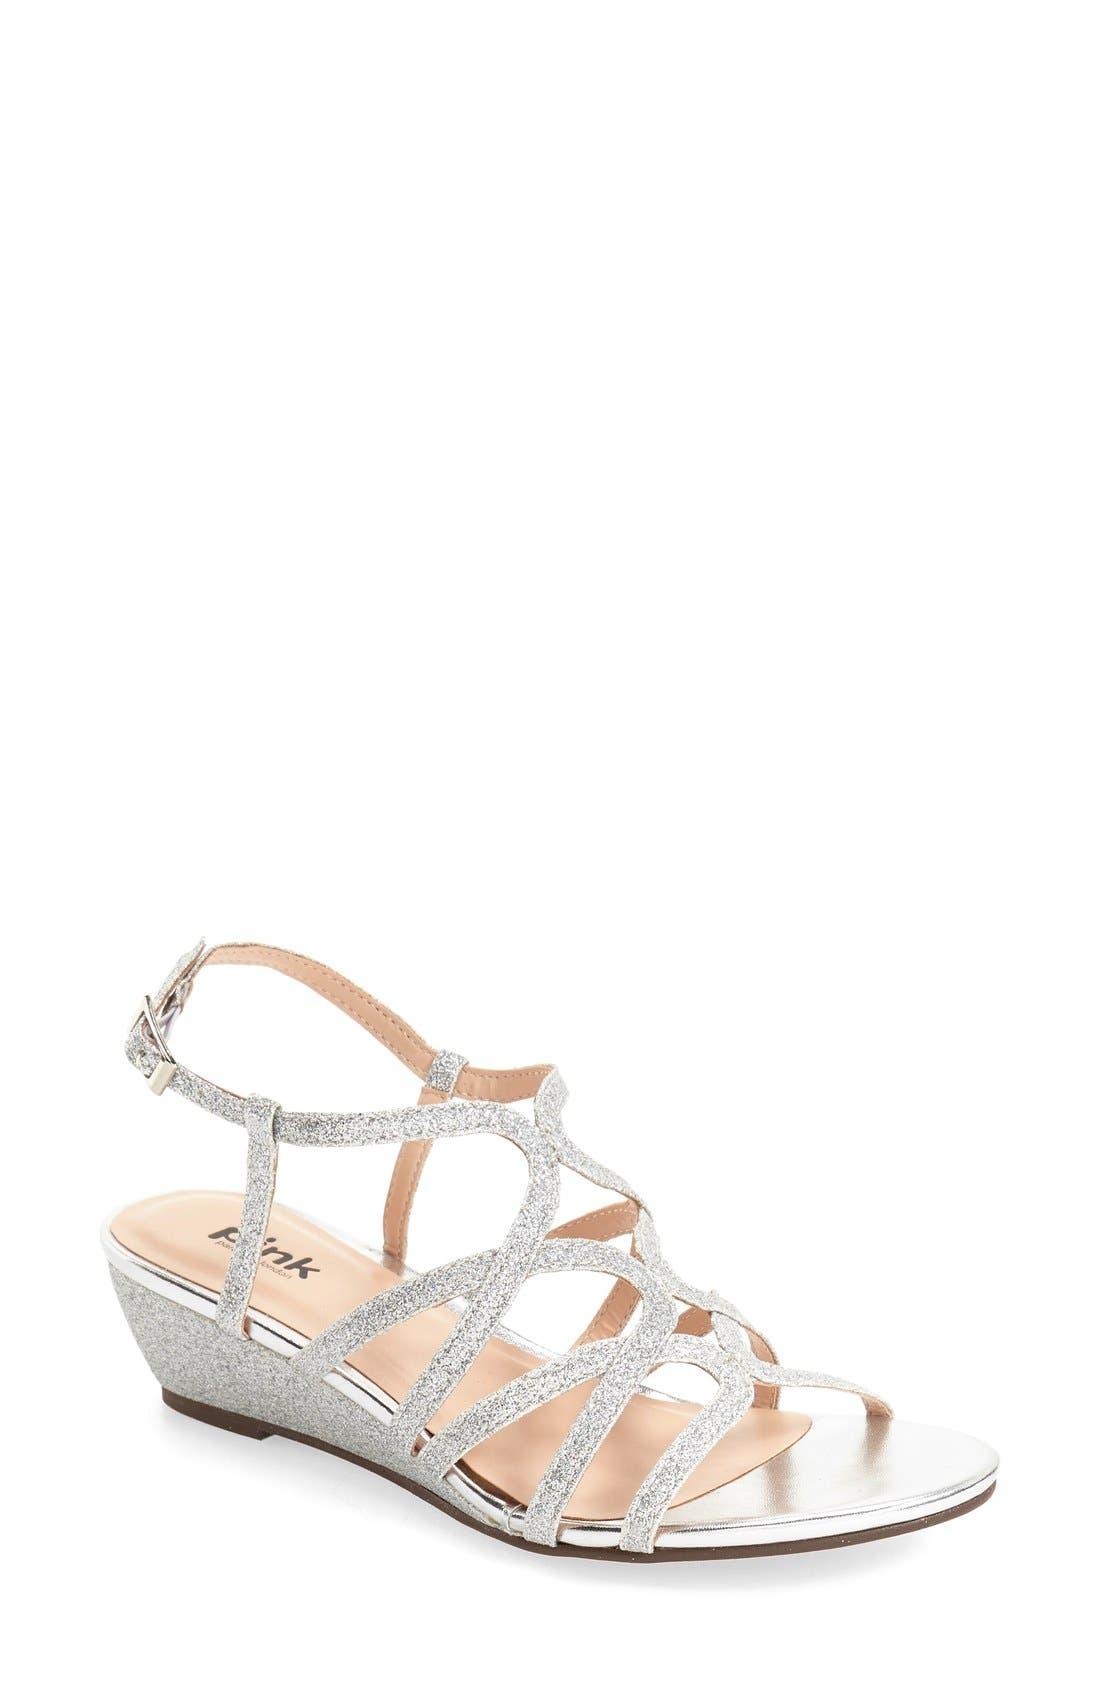 'Opulent' Wedge Sandal,                         Main,                         color, Silver